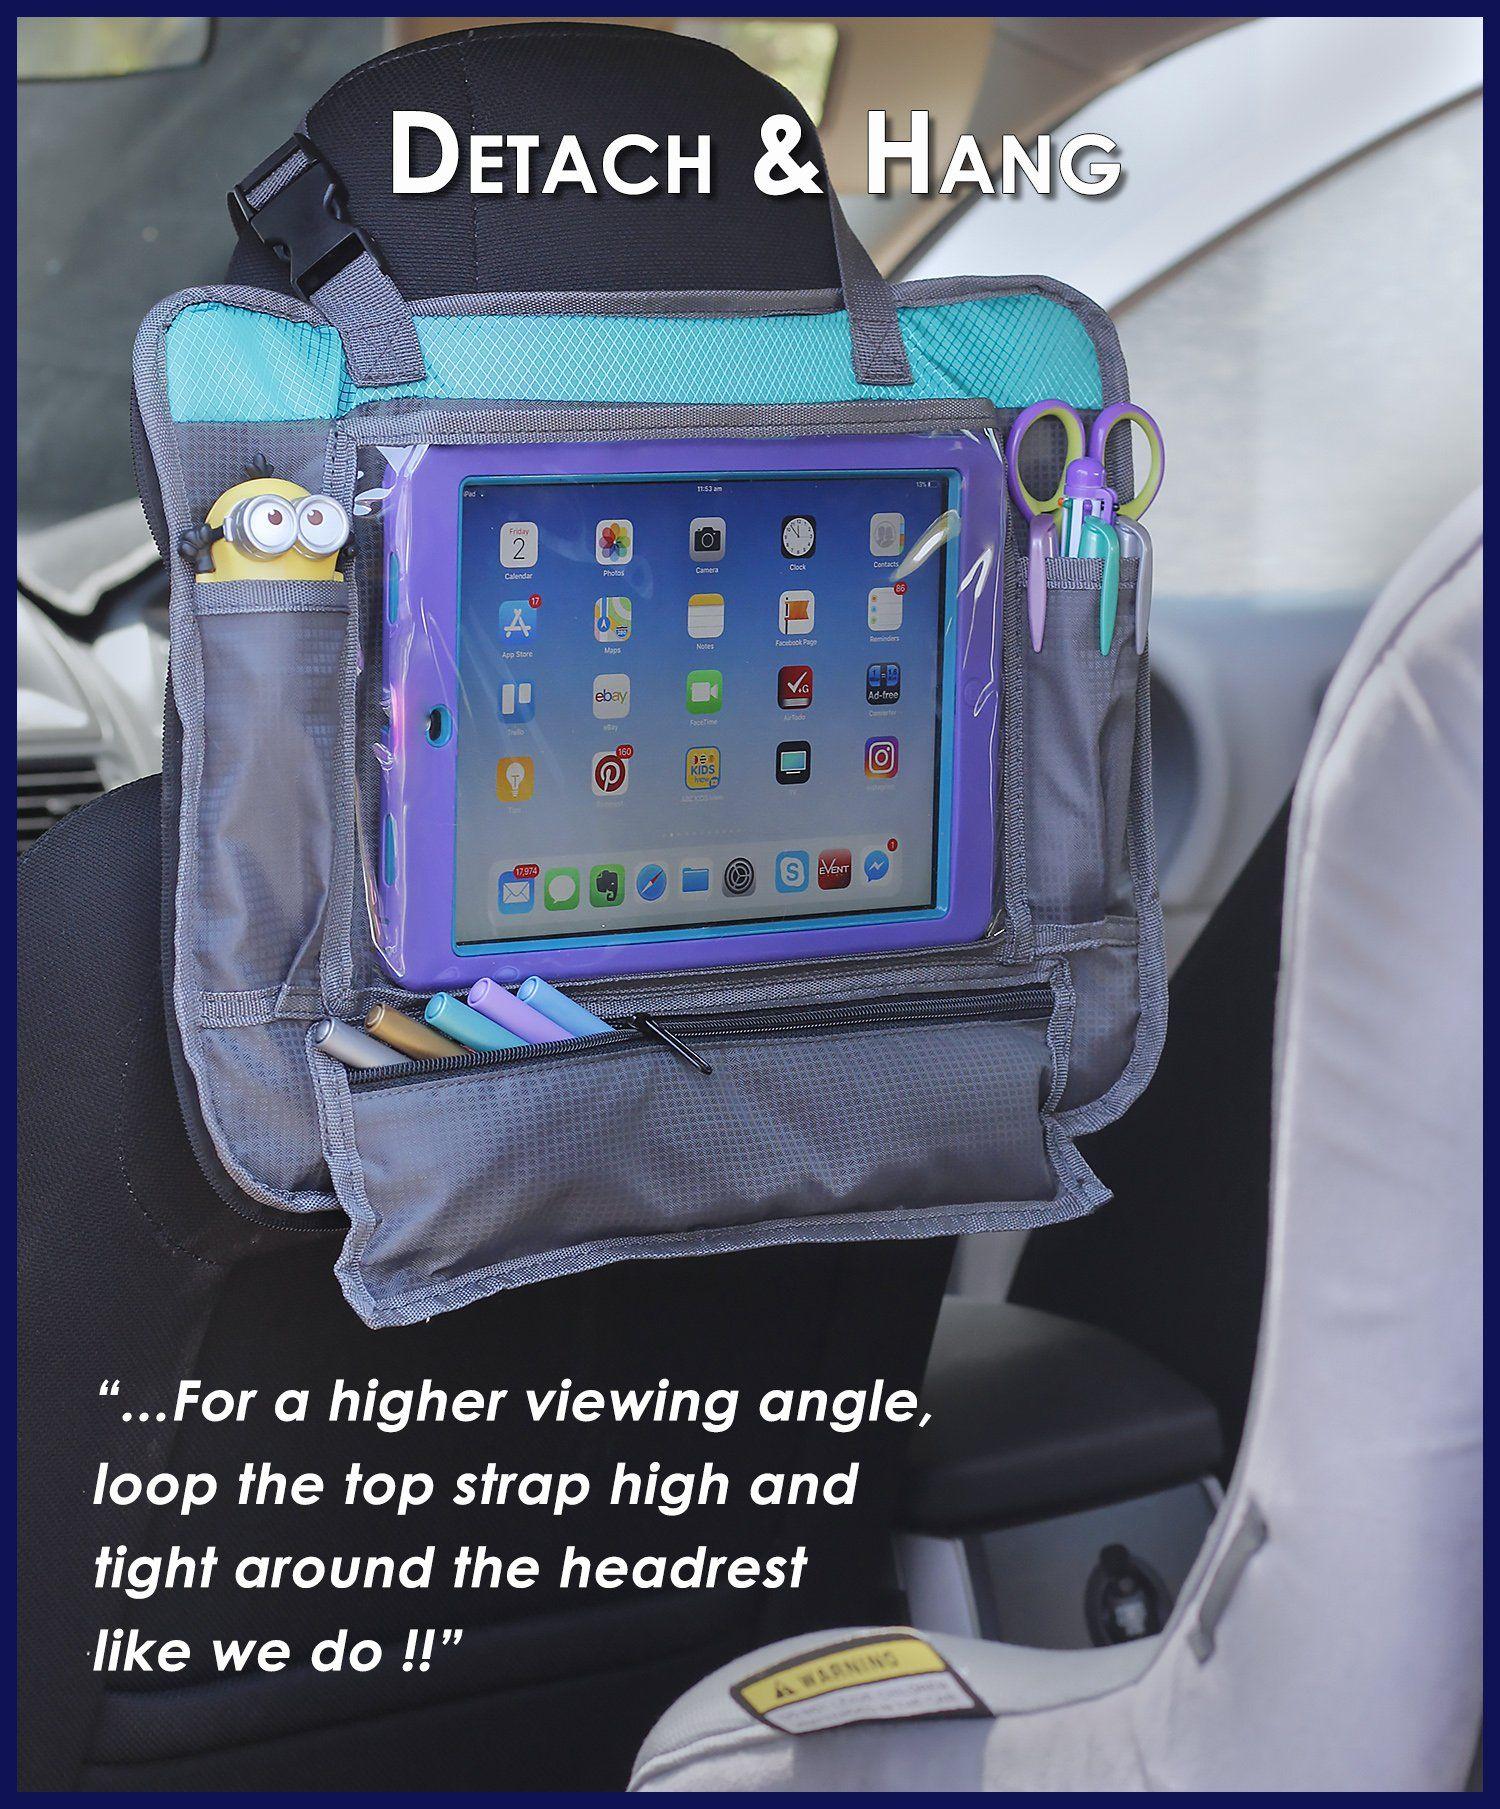 ORGANIZED EMPIRE's Detachable 4 in 1 Kids Travel Tray